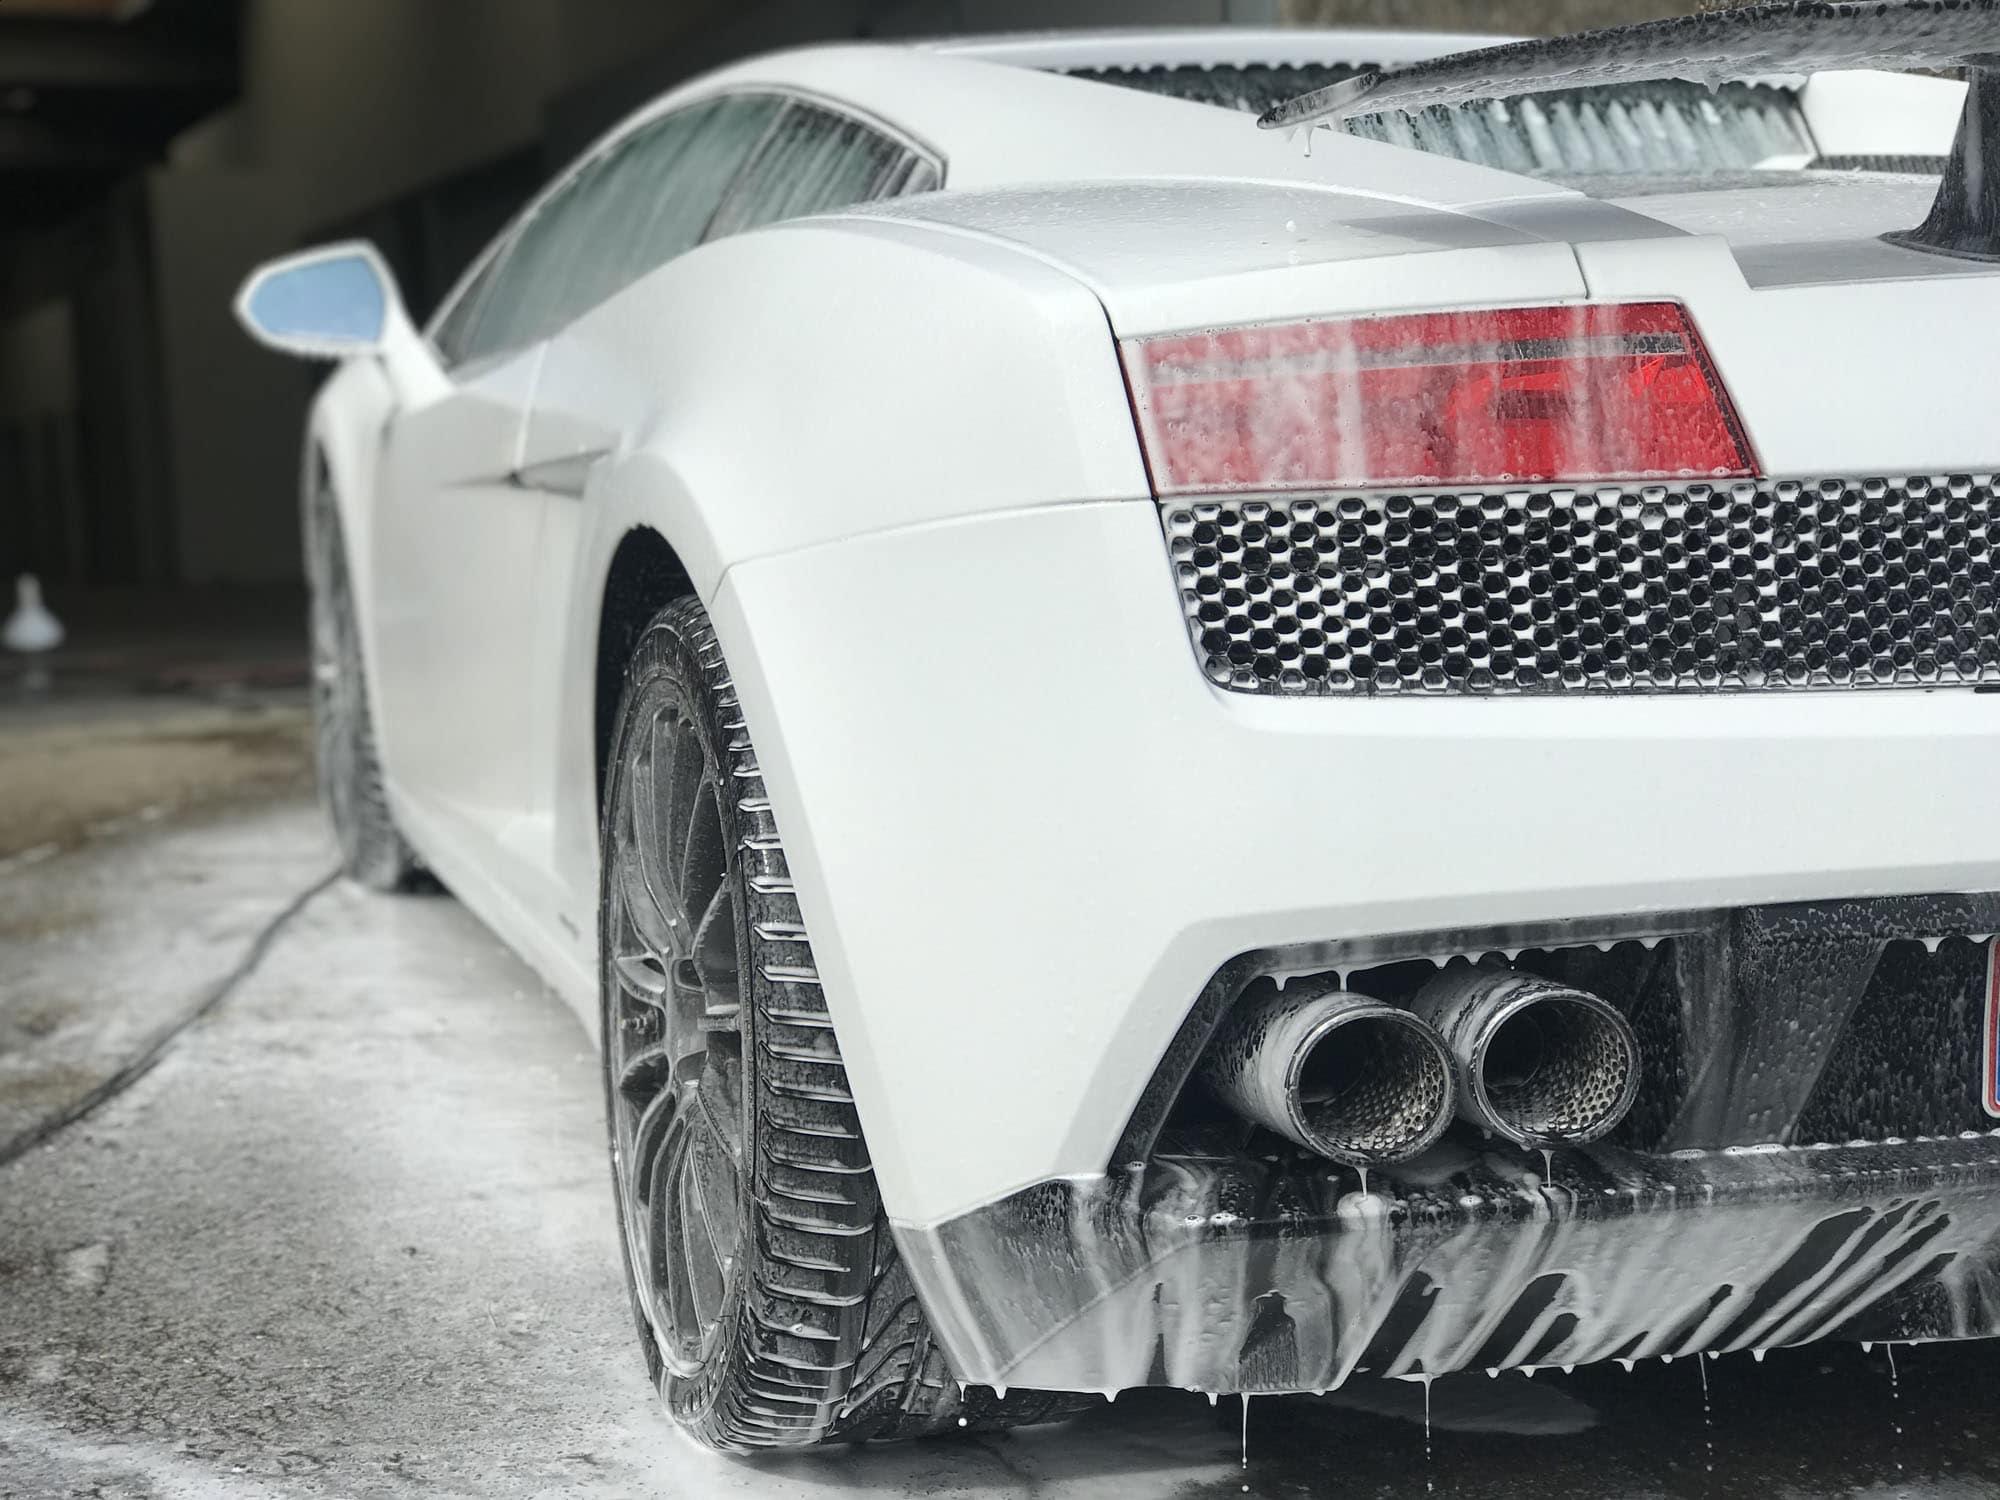 Lambo G Snowfoam - klargøring af bil